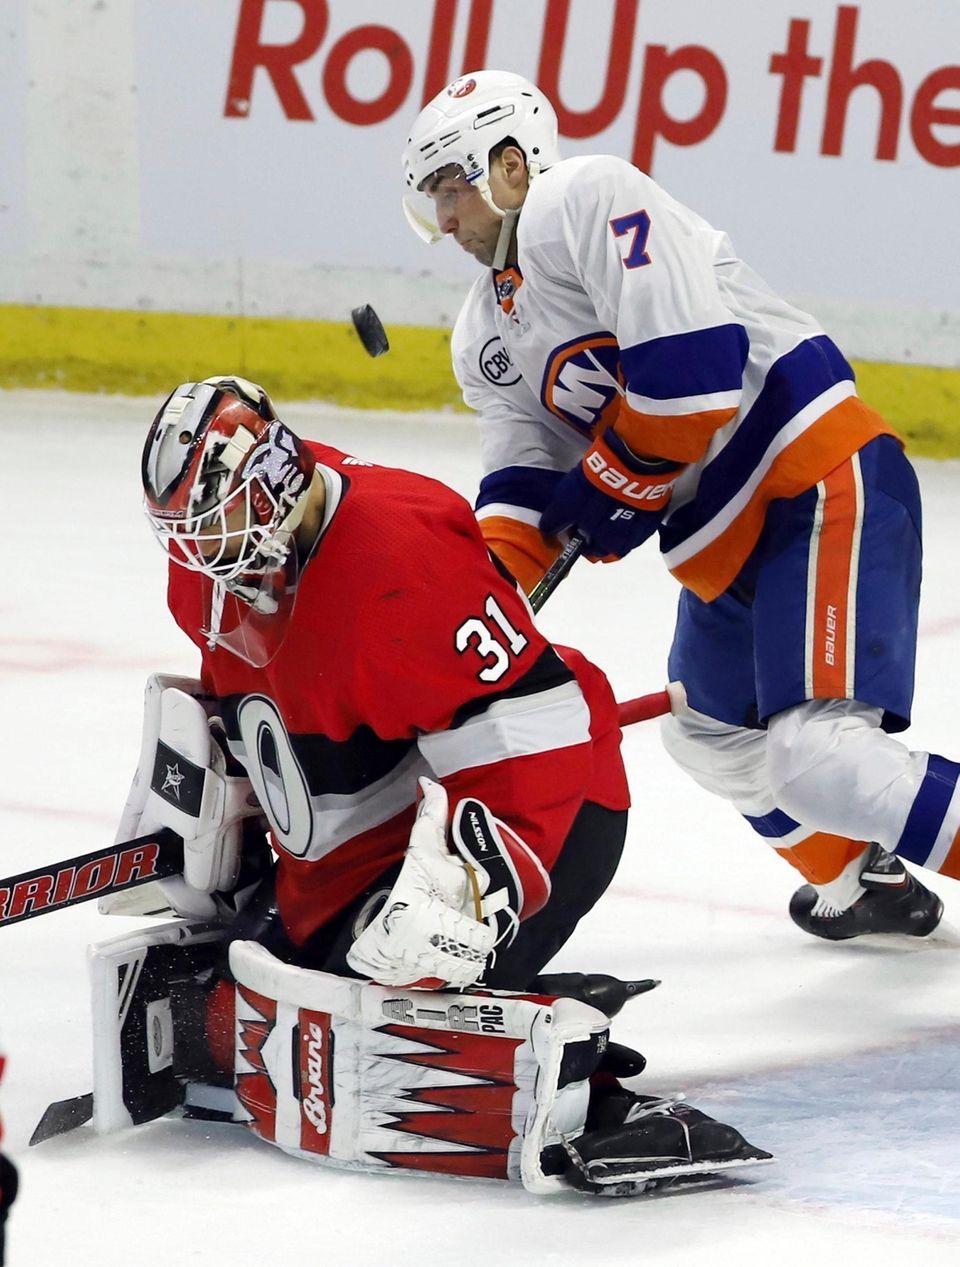 The puck gets behind Ottawa Senators goaltender Anders